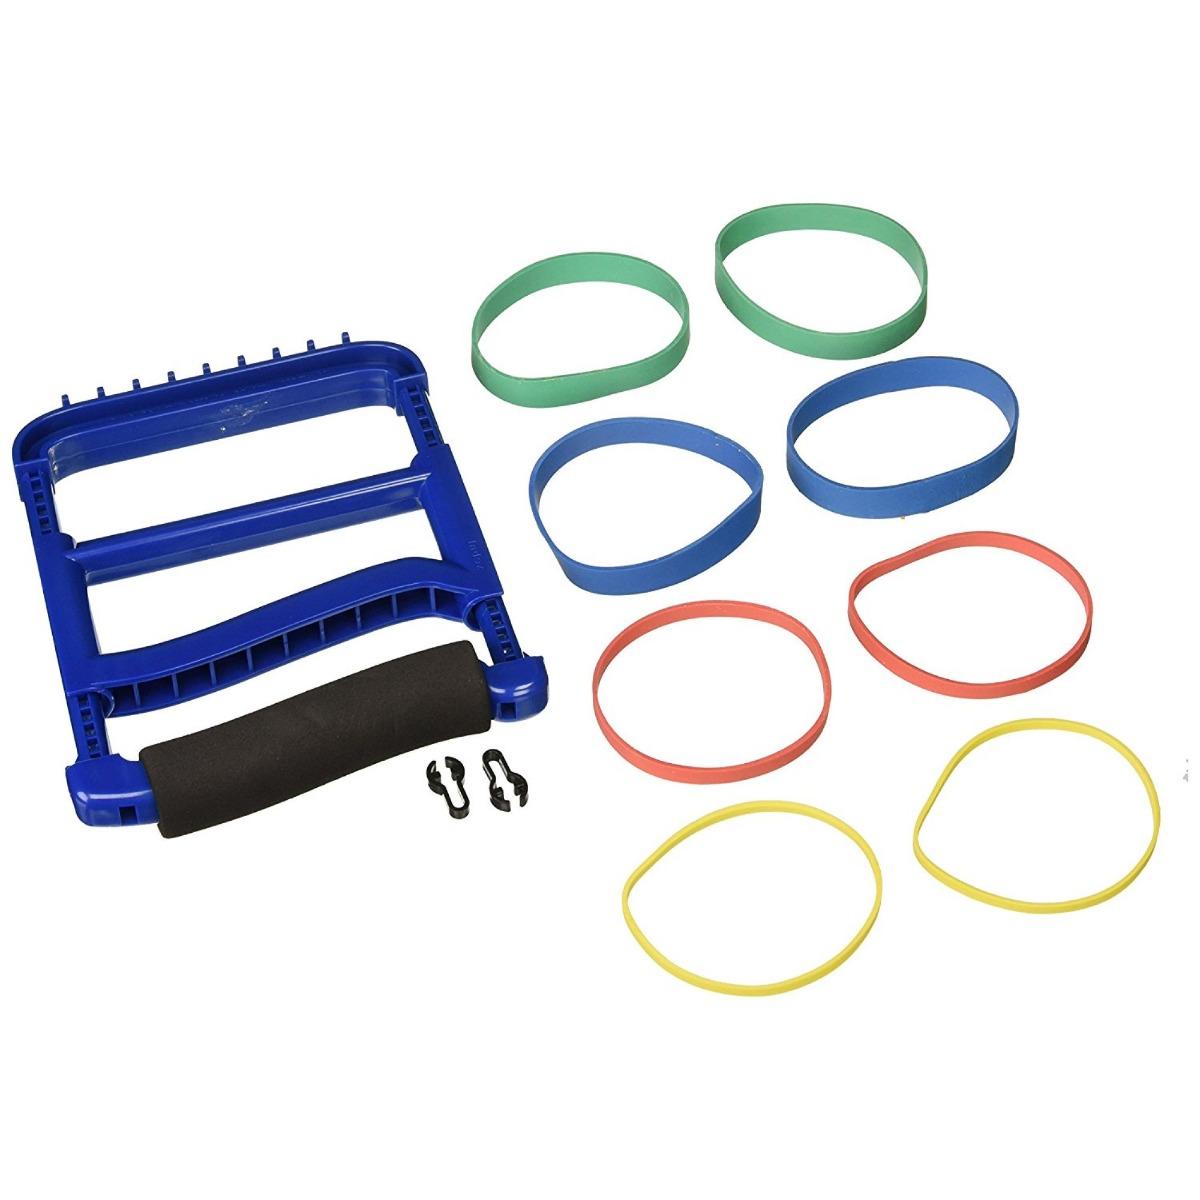 Rolyan Ergonomic Hand Exerciser, Blue, Each